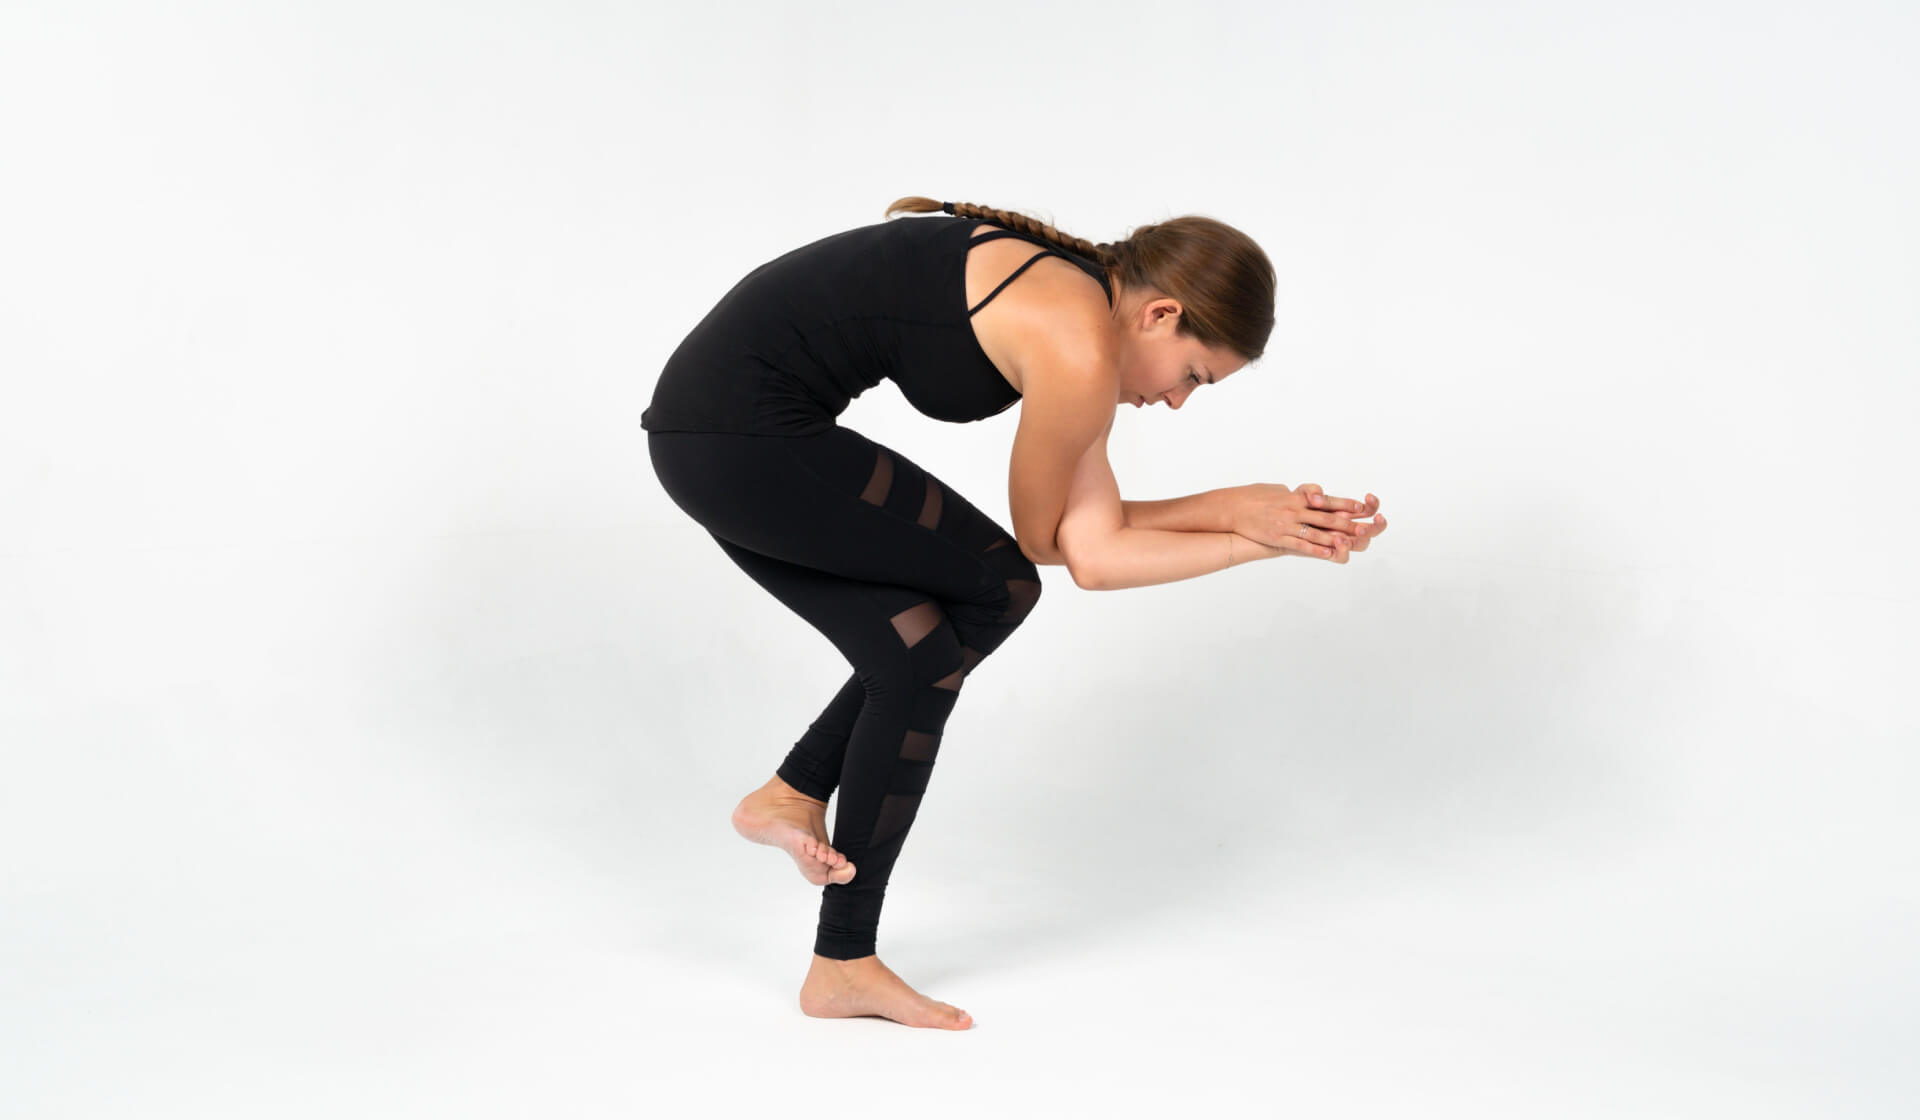 Woman yoga teacher dressed in all black practicing a balancing yoga pose (sleeping eagle pose or garudasana) against a white backdrop